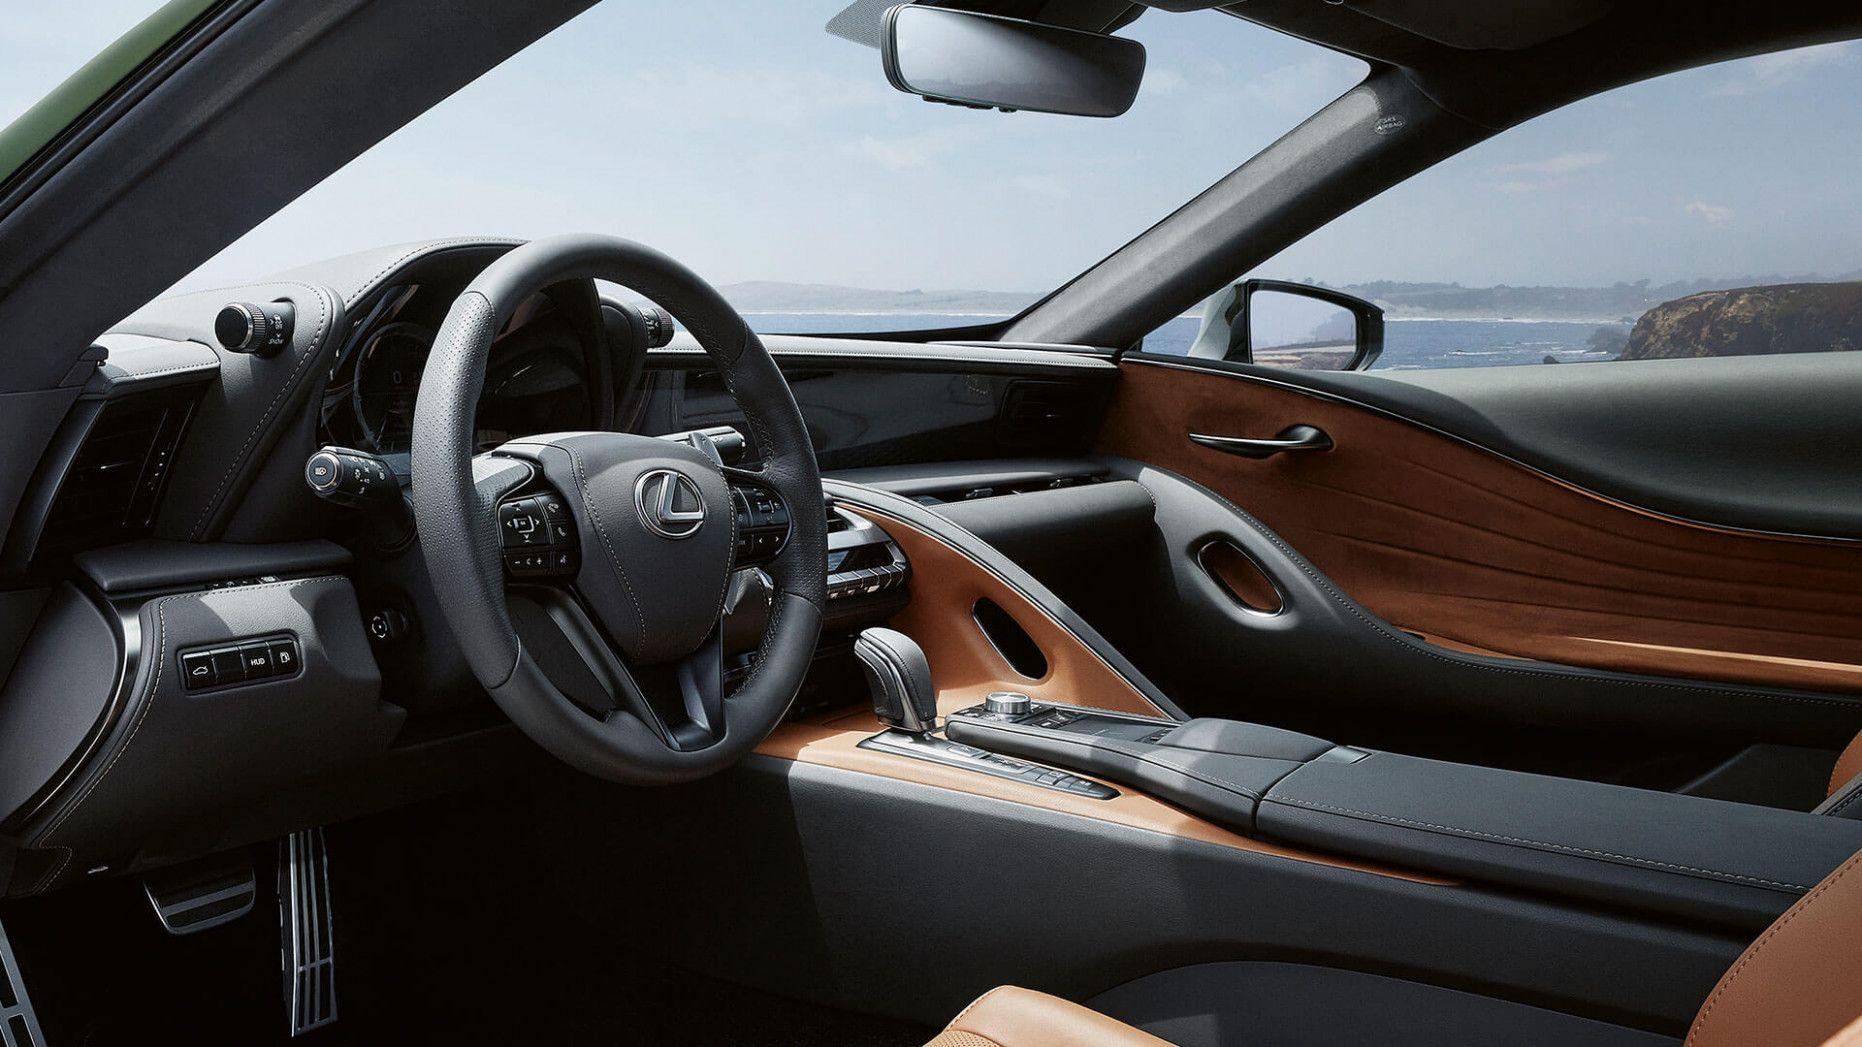 10 Picture 2020 Lexus Lc Price In 2020 Lexus Lc Bmw Convertible Lexus